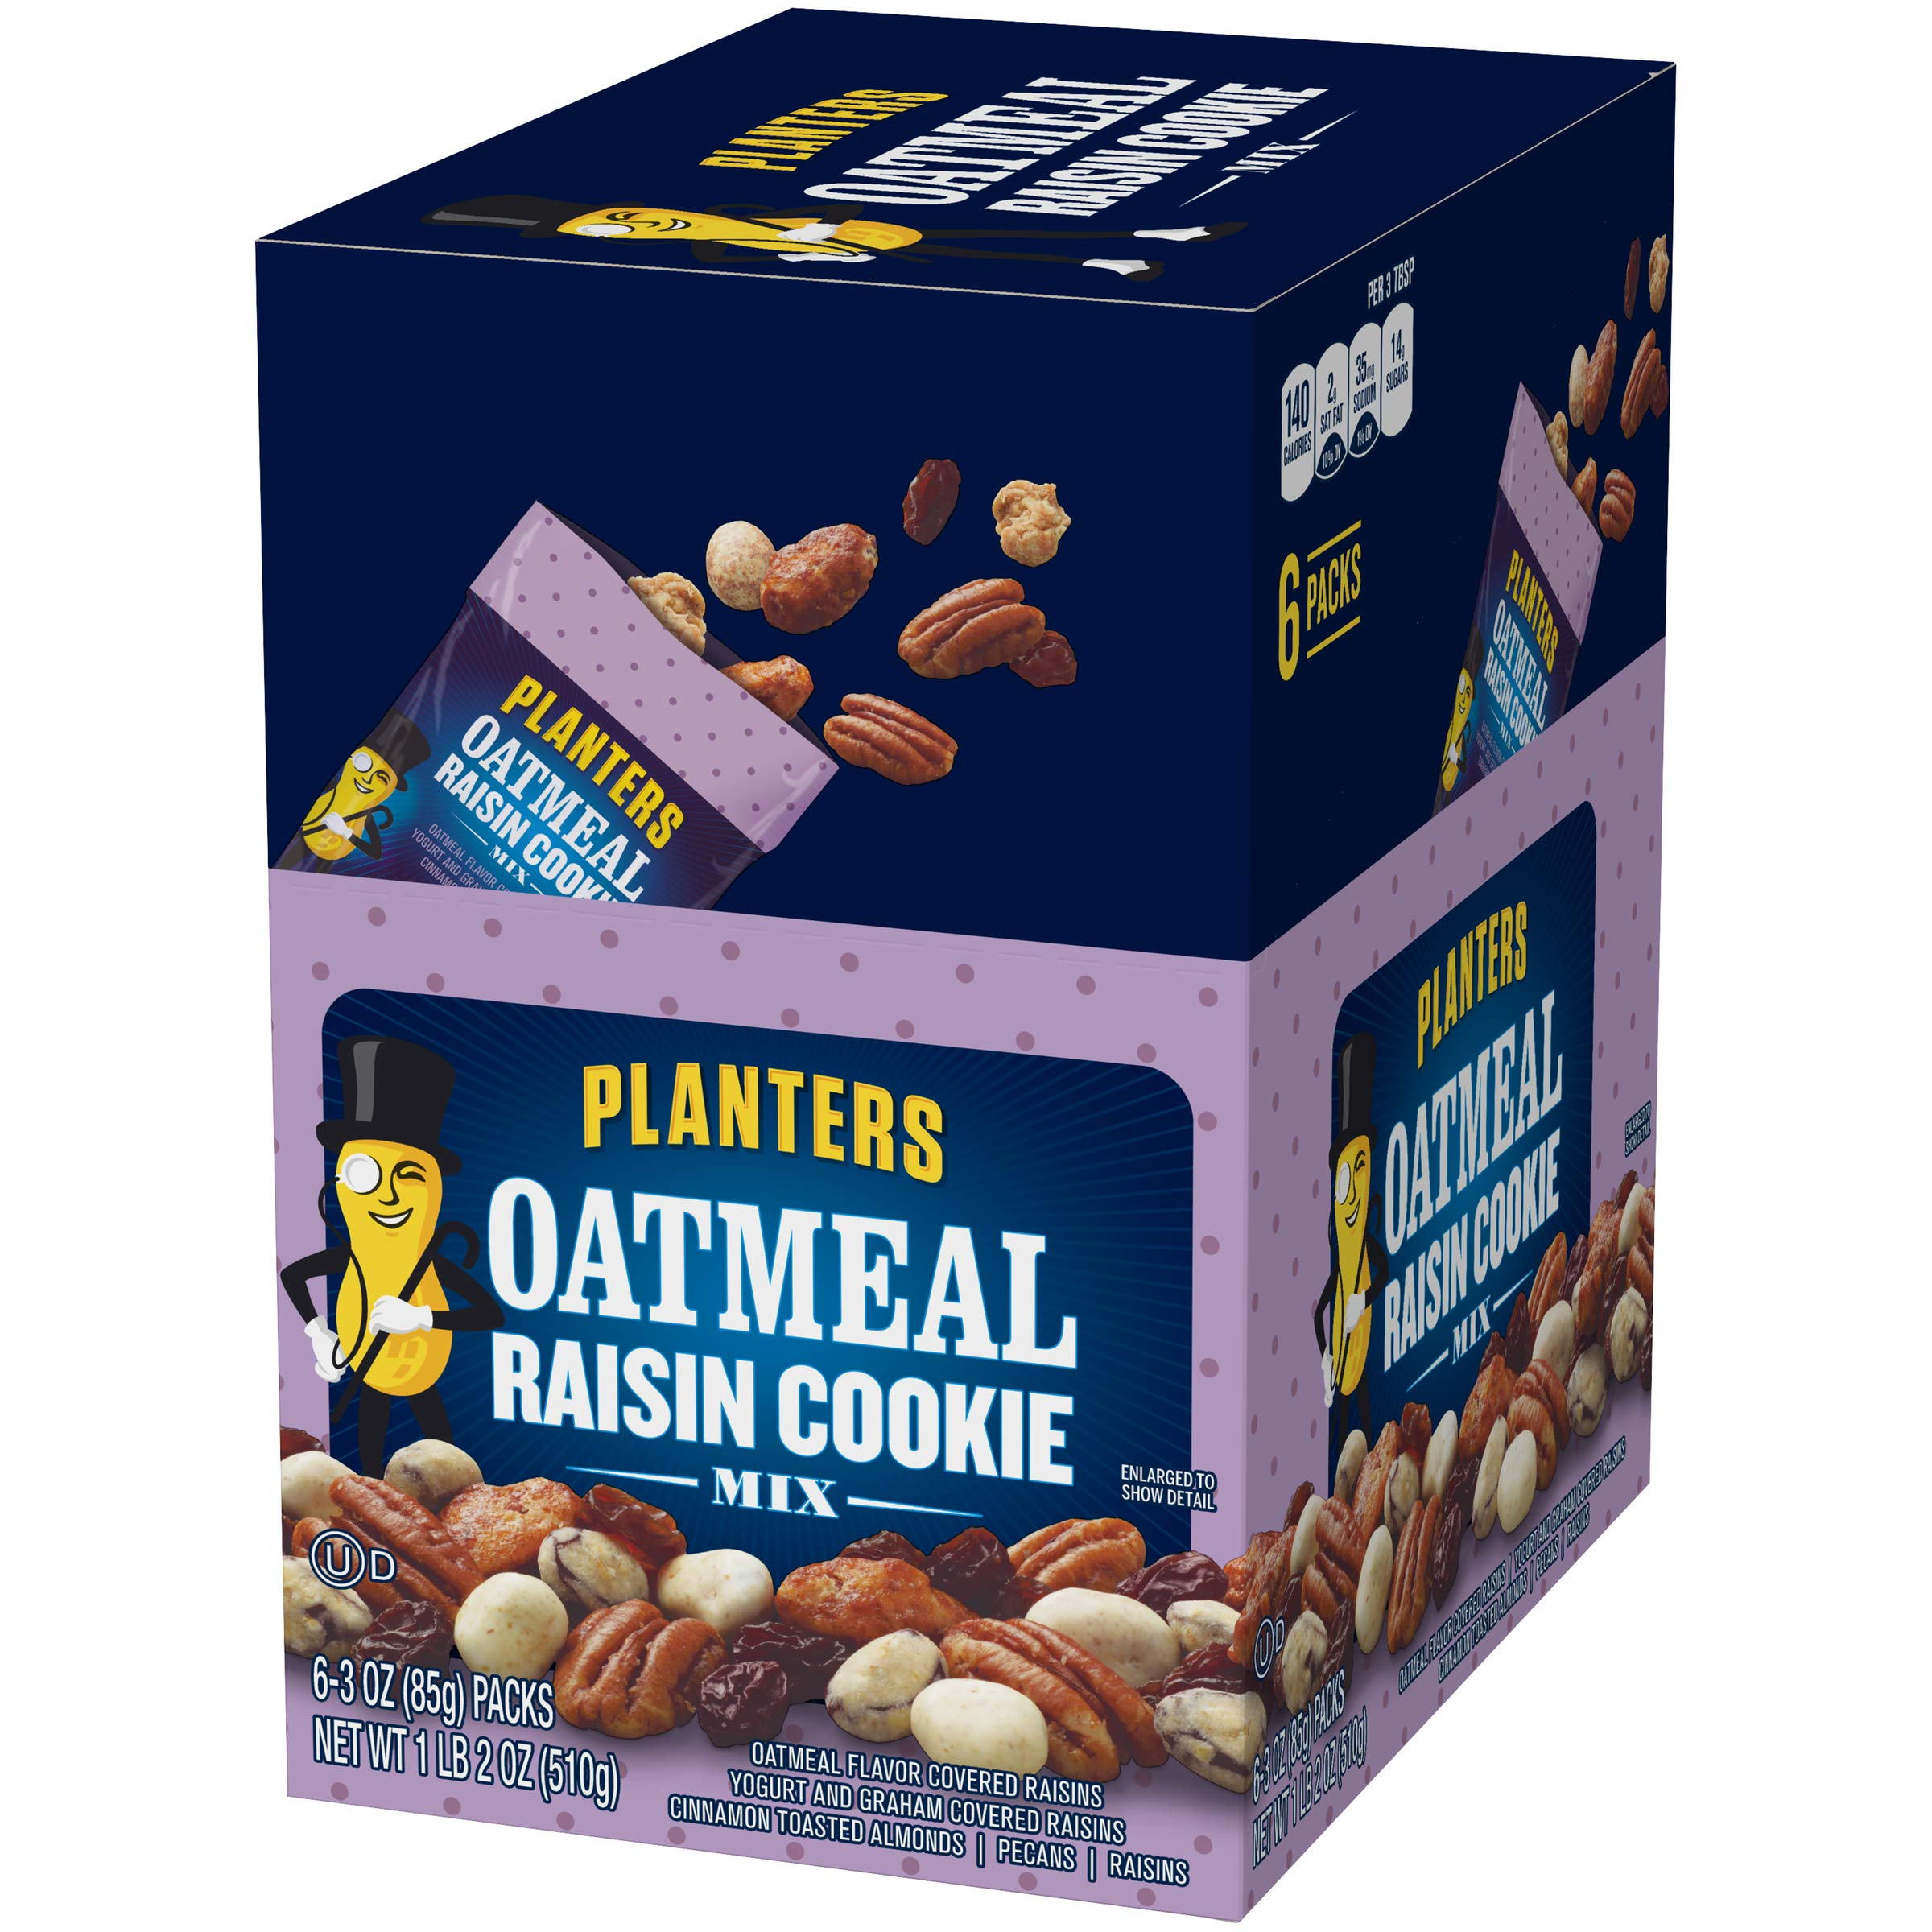 Amazon.com : Planters Oatmeal Raisin Cookie Mix, 3.0 Ounce (Pack of on amazon home, amazon hammocks, amazon fire pits, amazon wall art, amazon lamps,